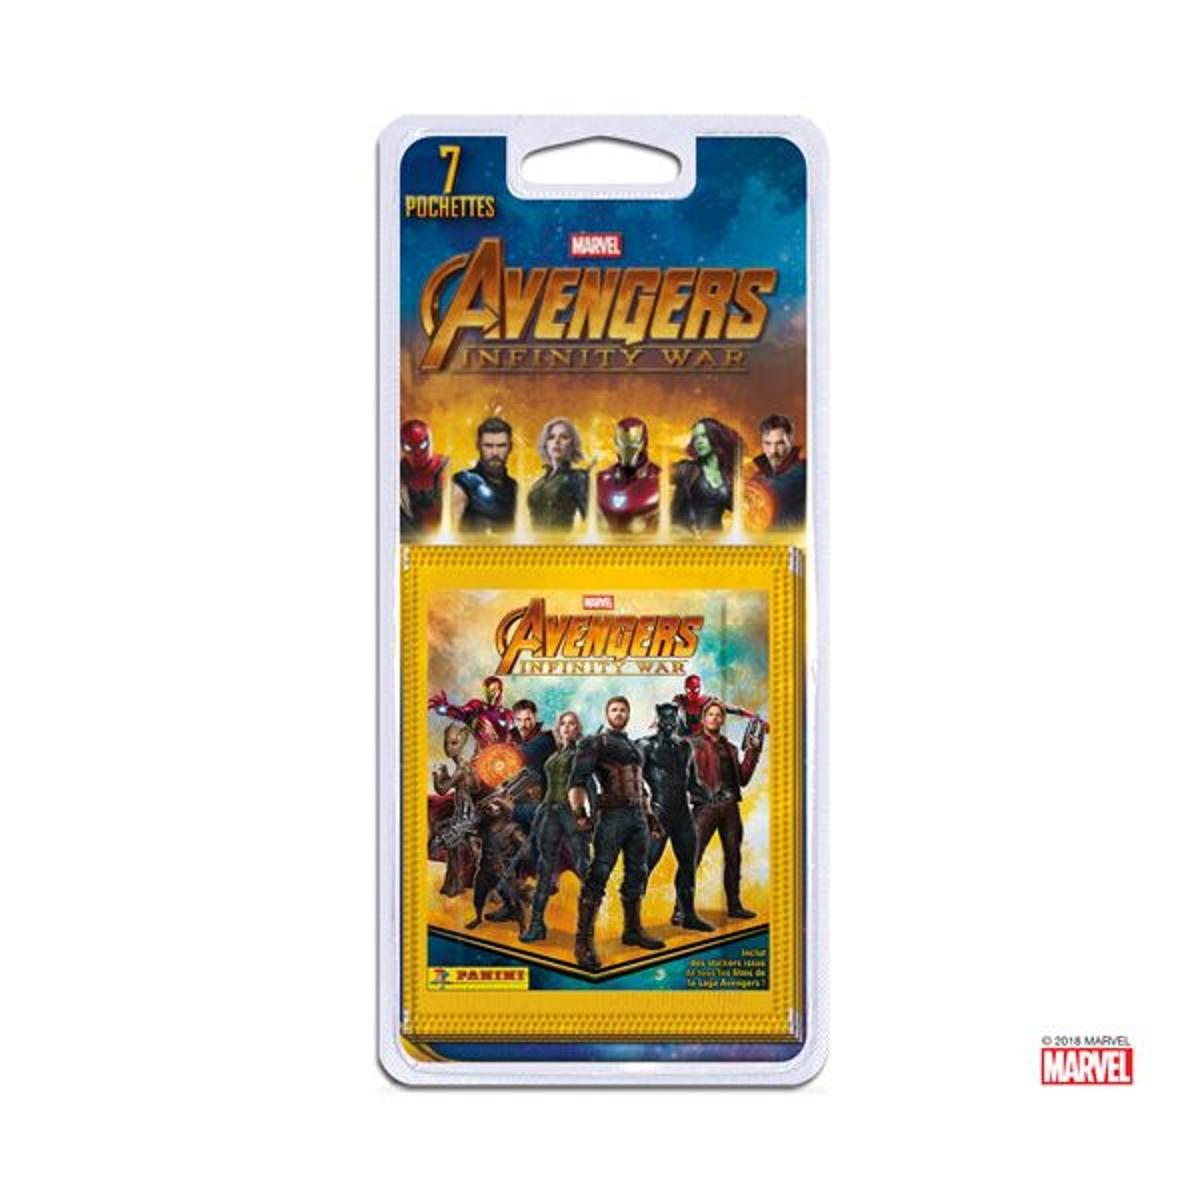 7 Pochettes Avengers Infinity War 1